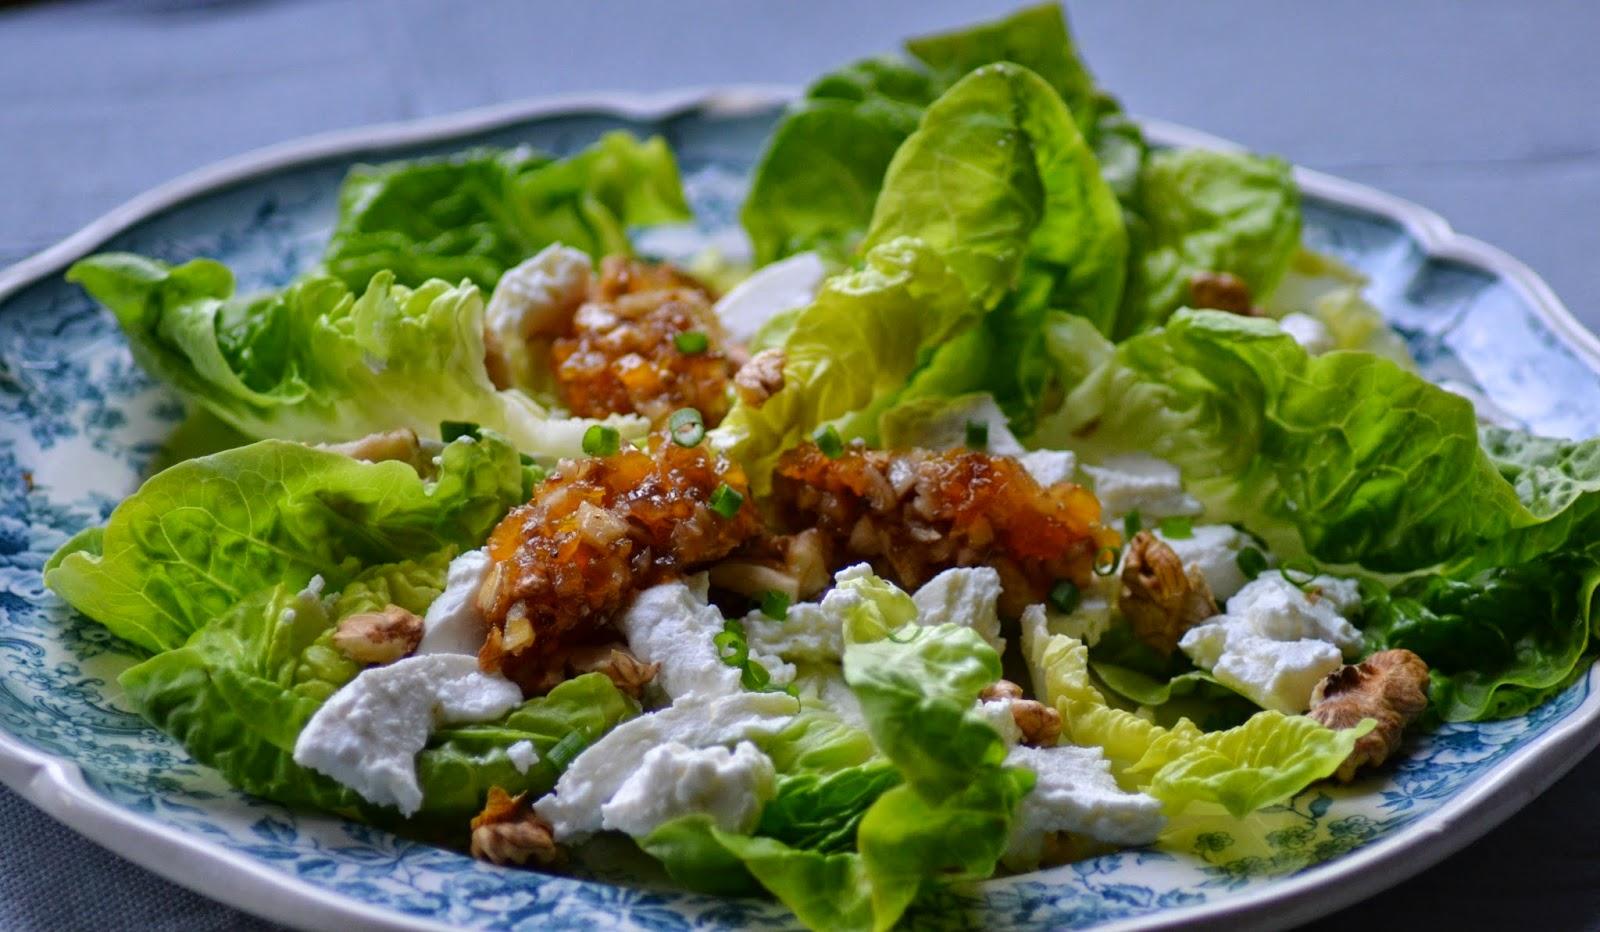 Salade met geitenkaas, noten, honing en gedroogd fruit